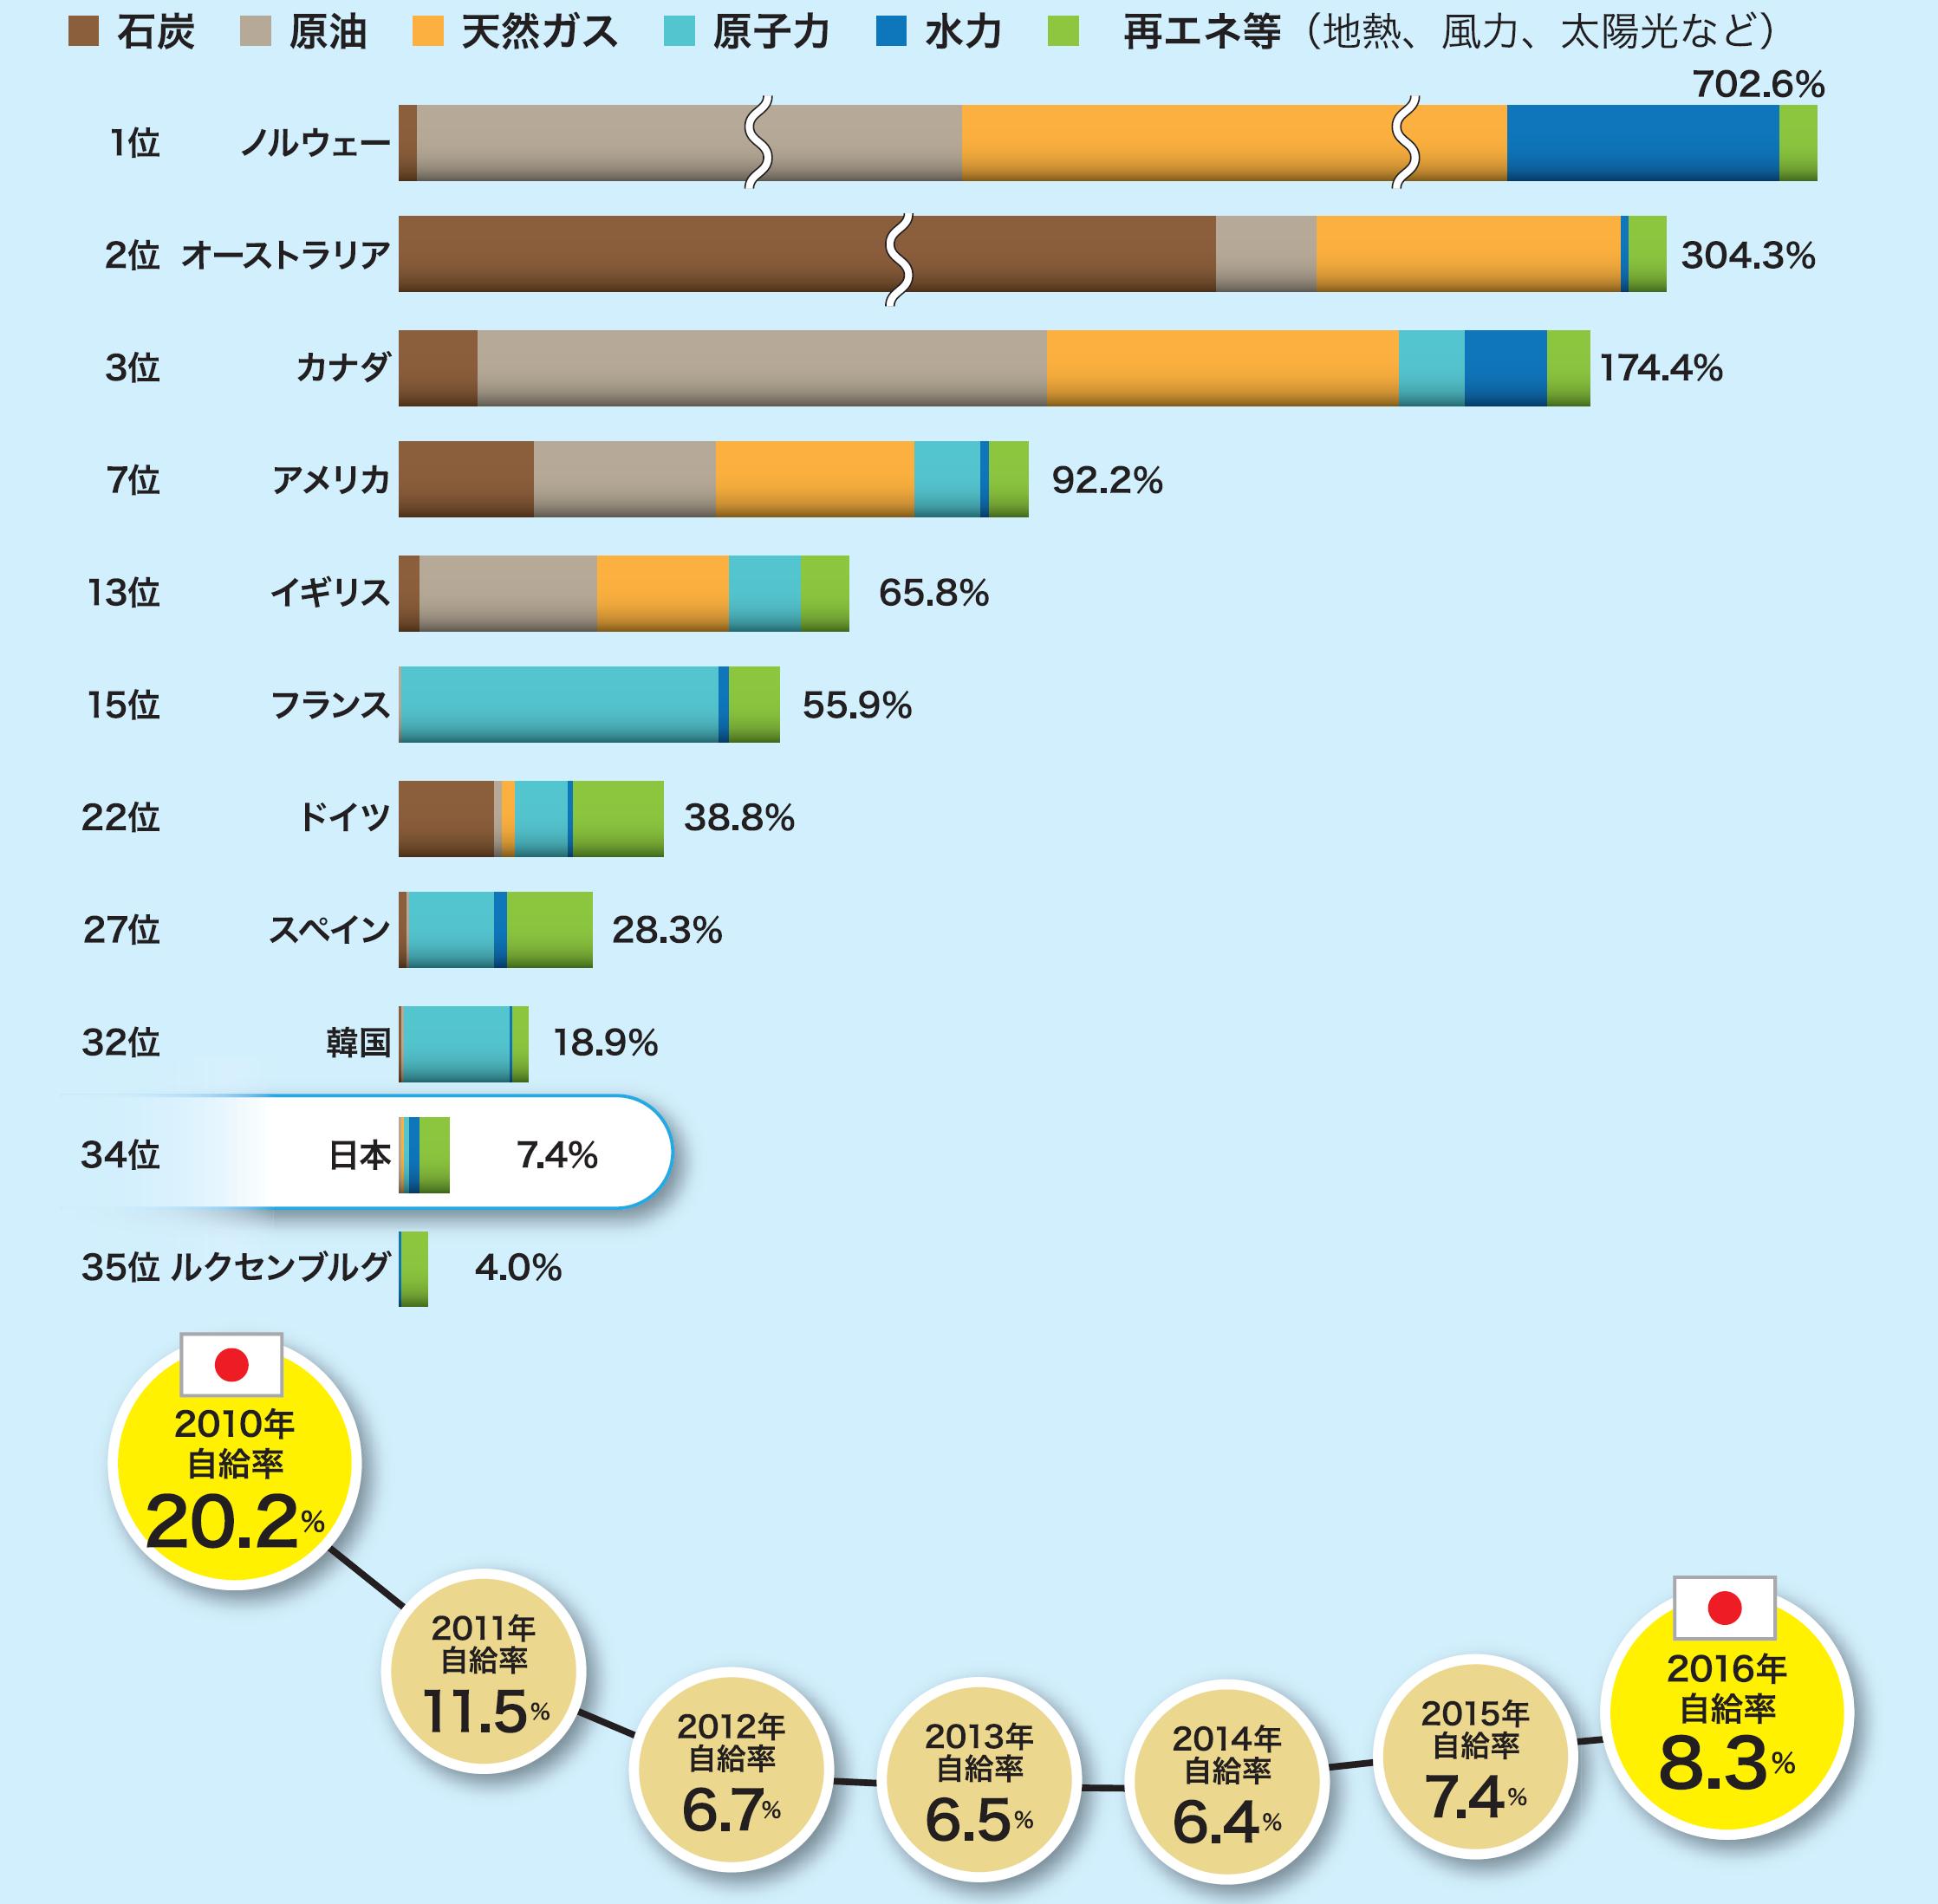 OECD加盟35カ国の2015年時点でのエネルギー自給率